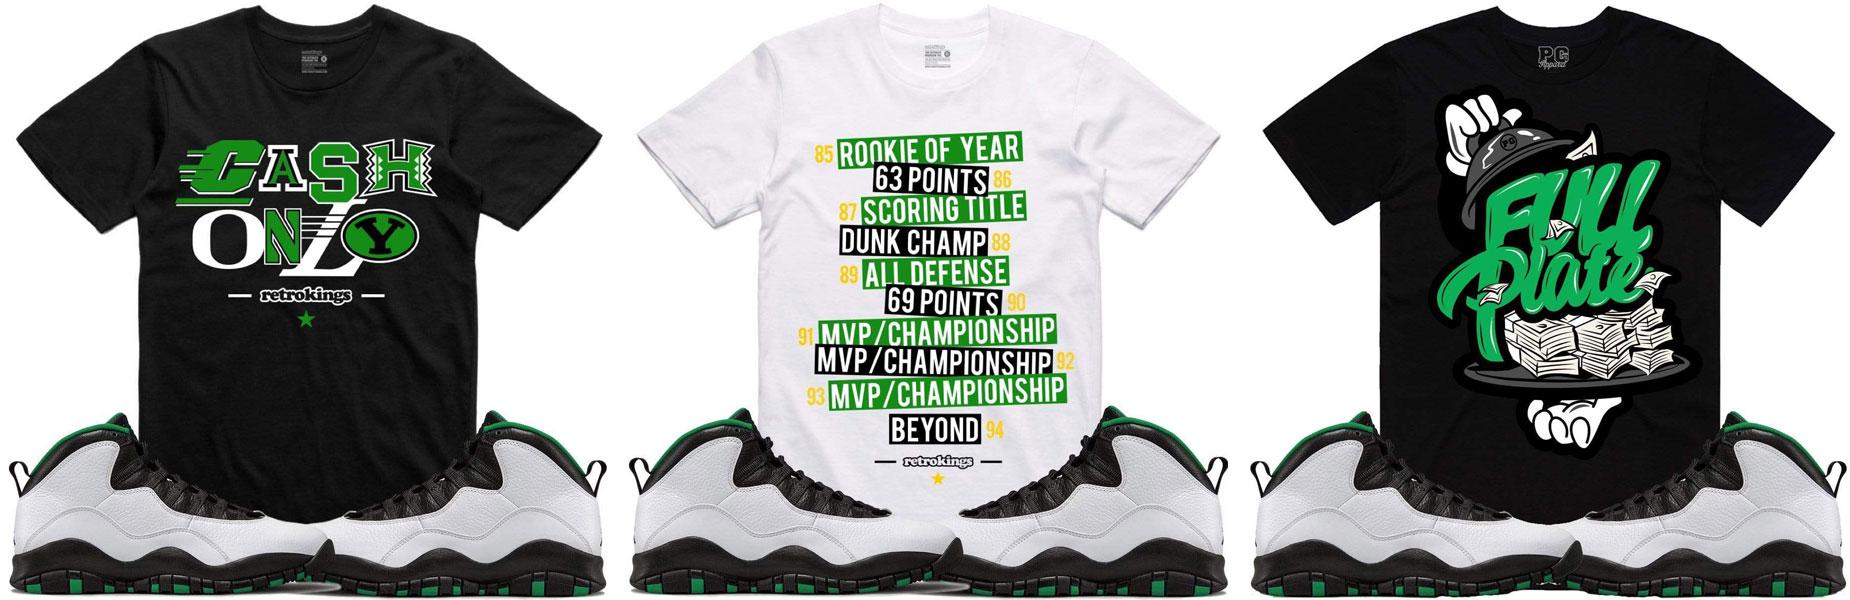 air-jordan-10-seattle-sneaker-tees-shirts